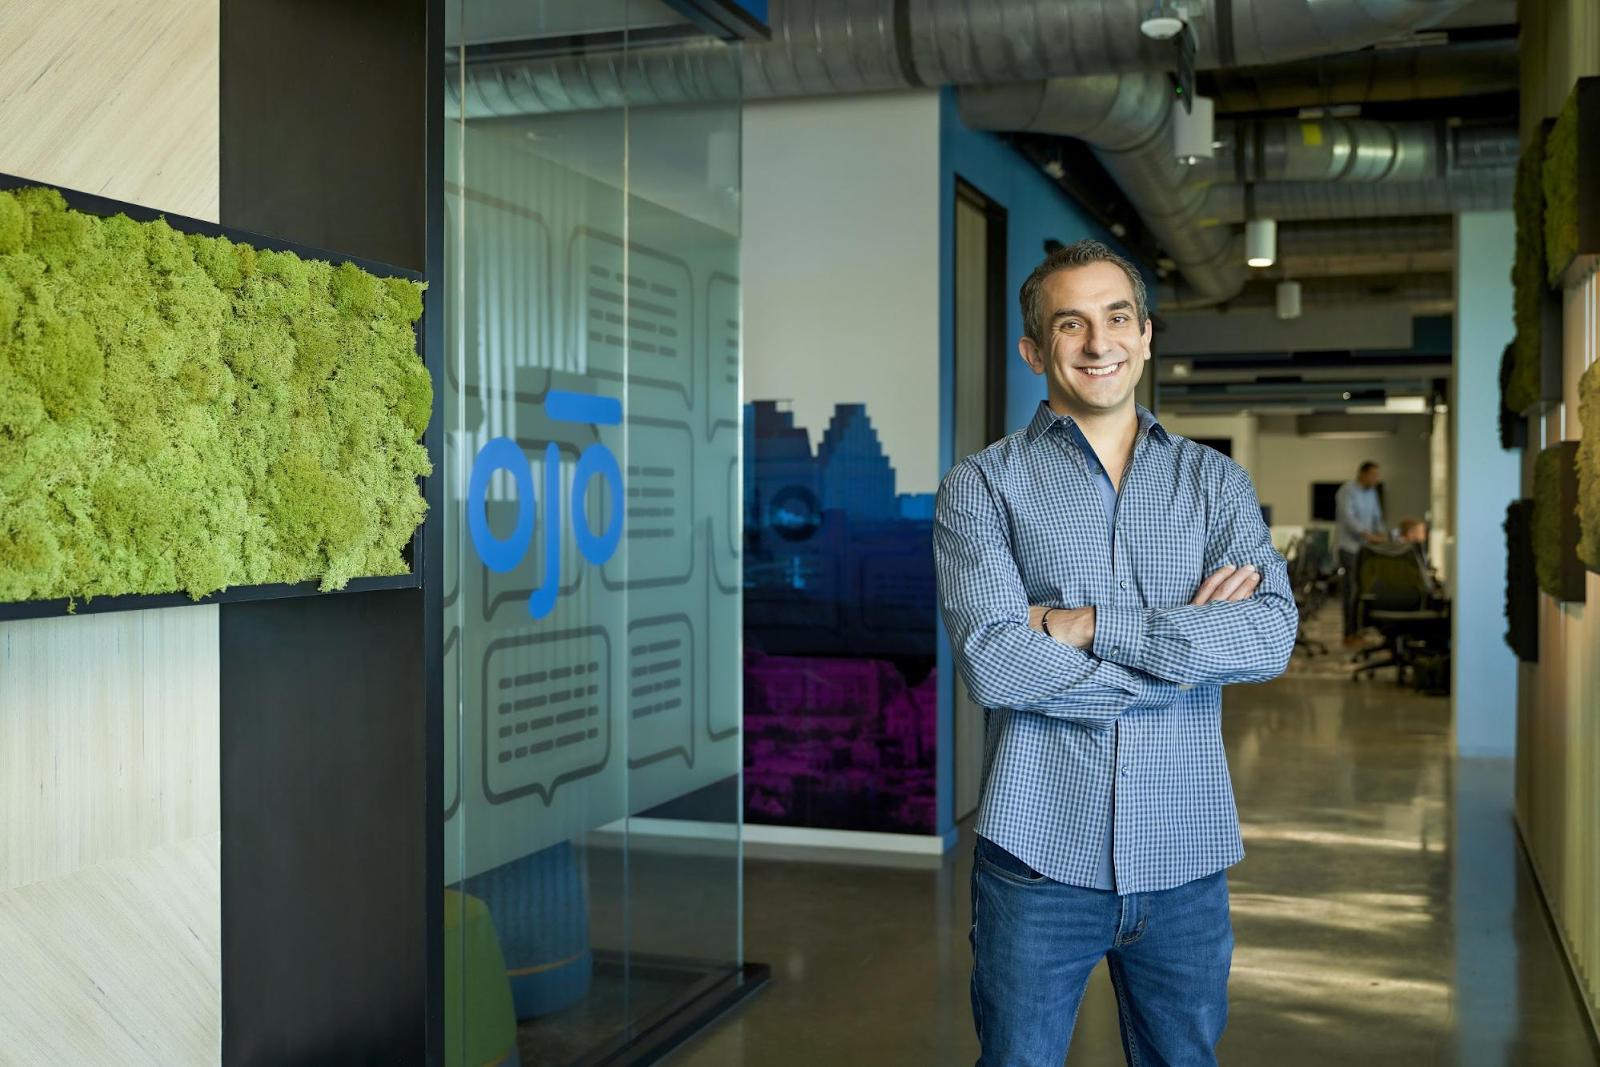 OJO Labs CEO